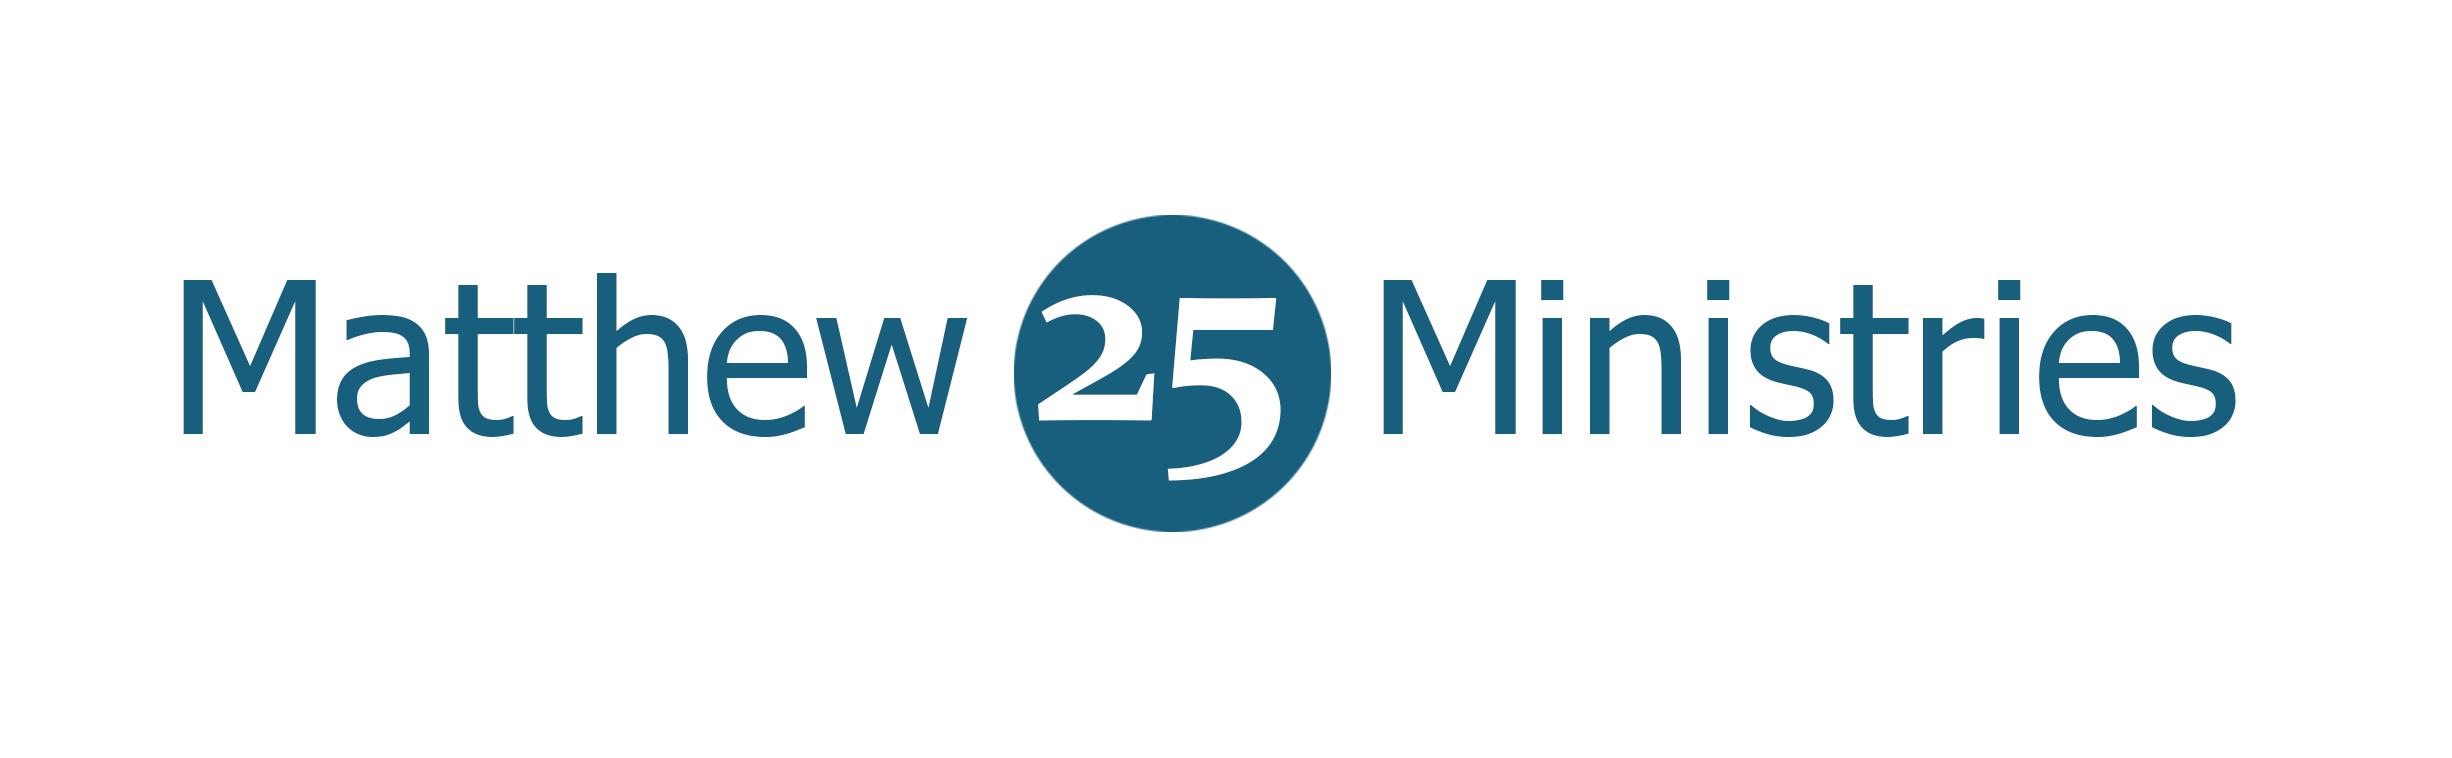 Matthew 25 Ministries logo rebuild.jpg